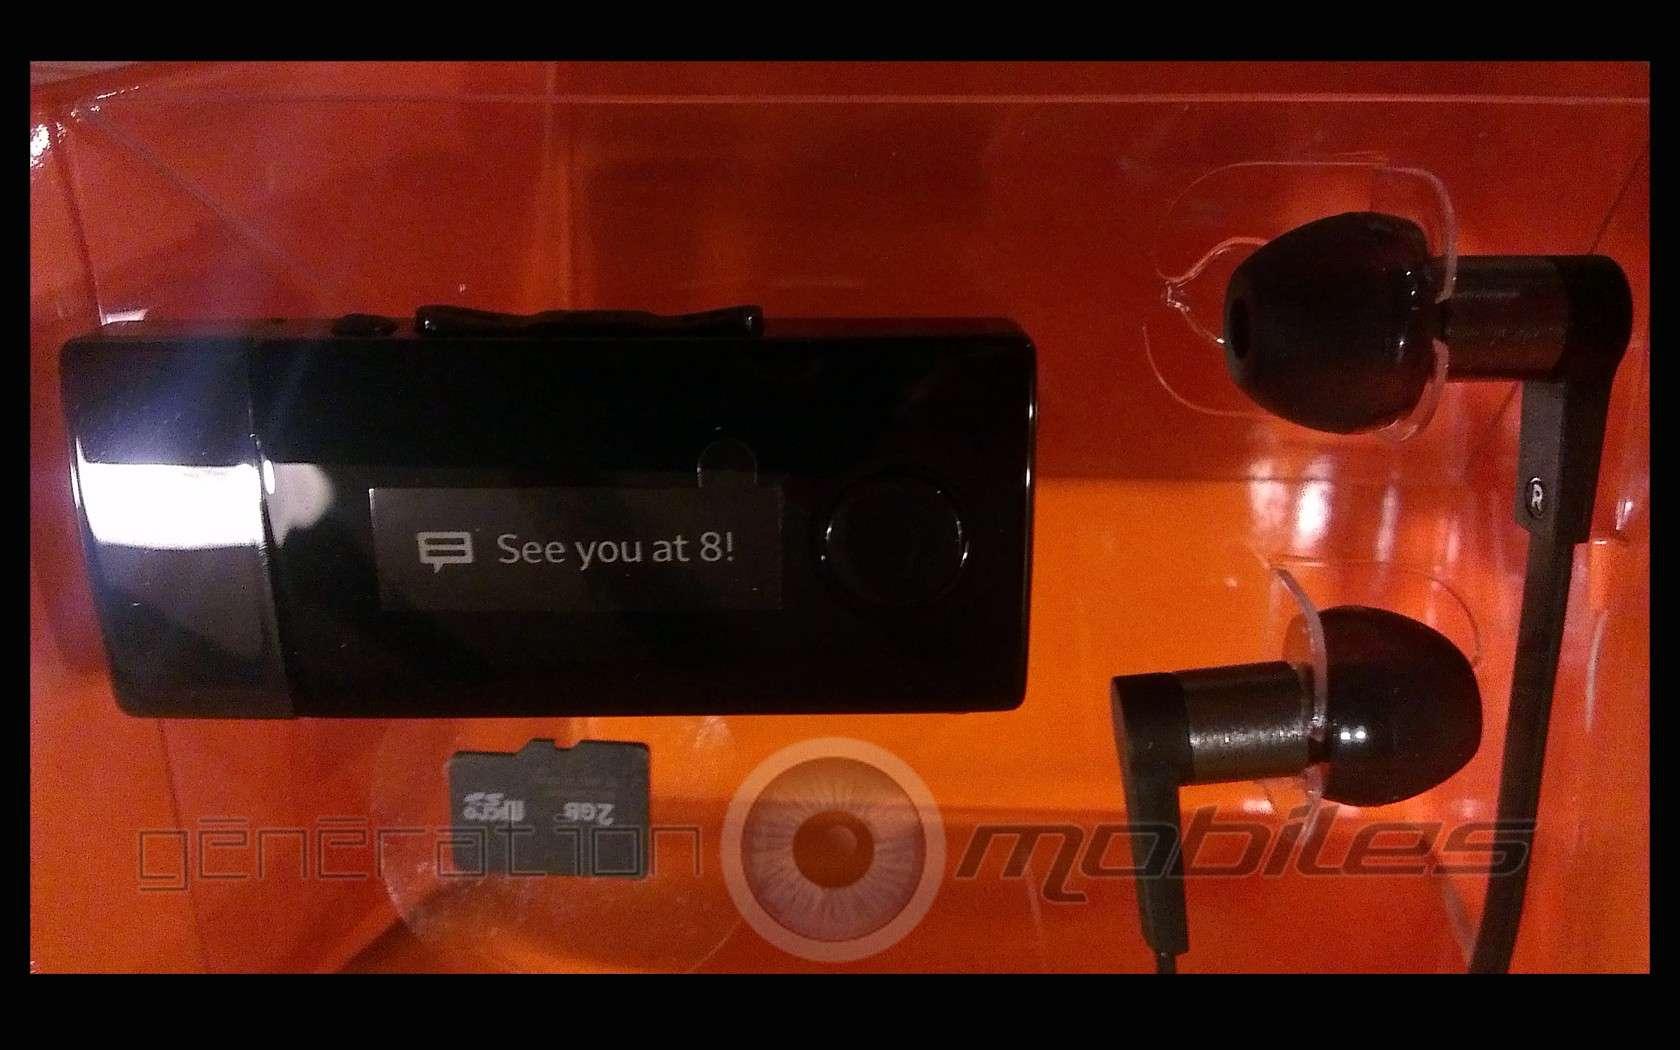 [MOBILEFUN.FR] Test du Sony Smart Wireless Headset Pro MW1 Boite210